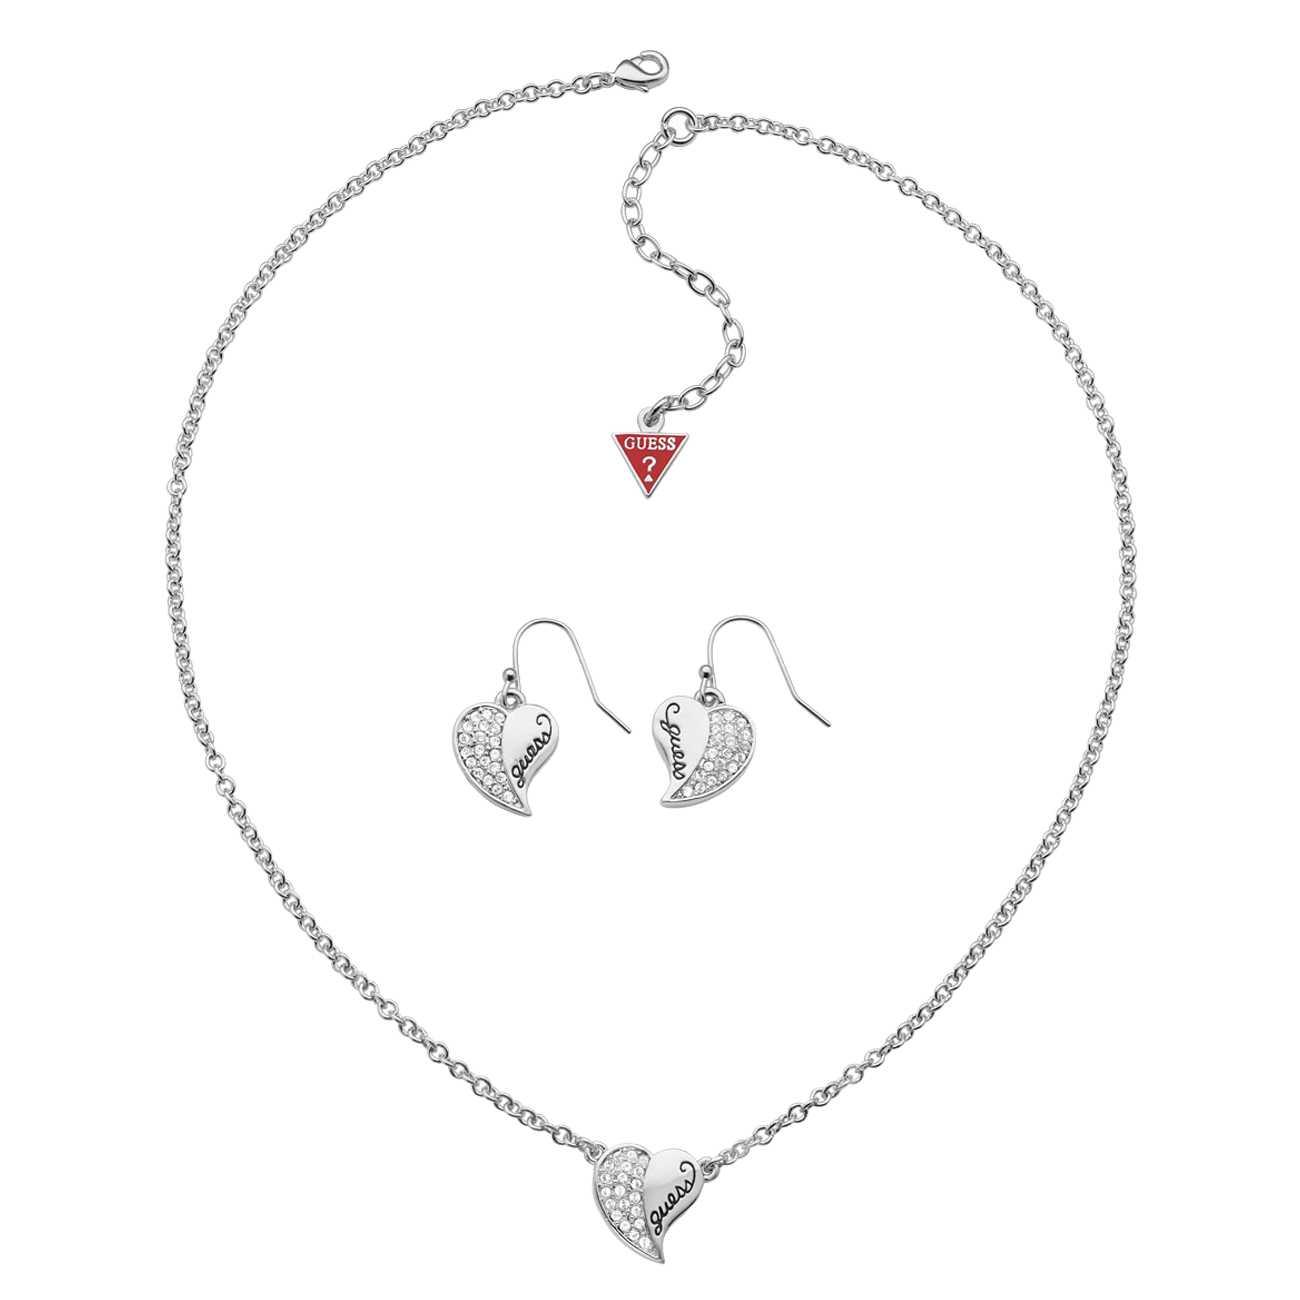 HEART PENDANT UBS11421 imagine produs